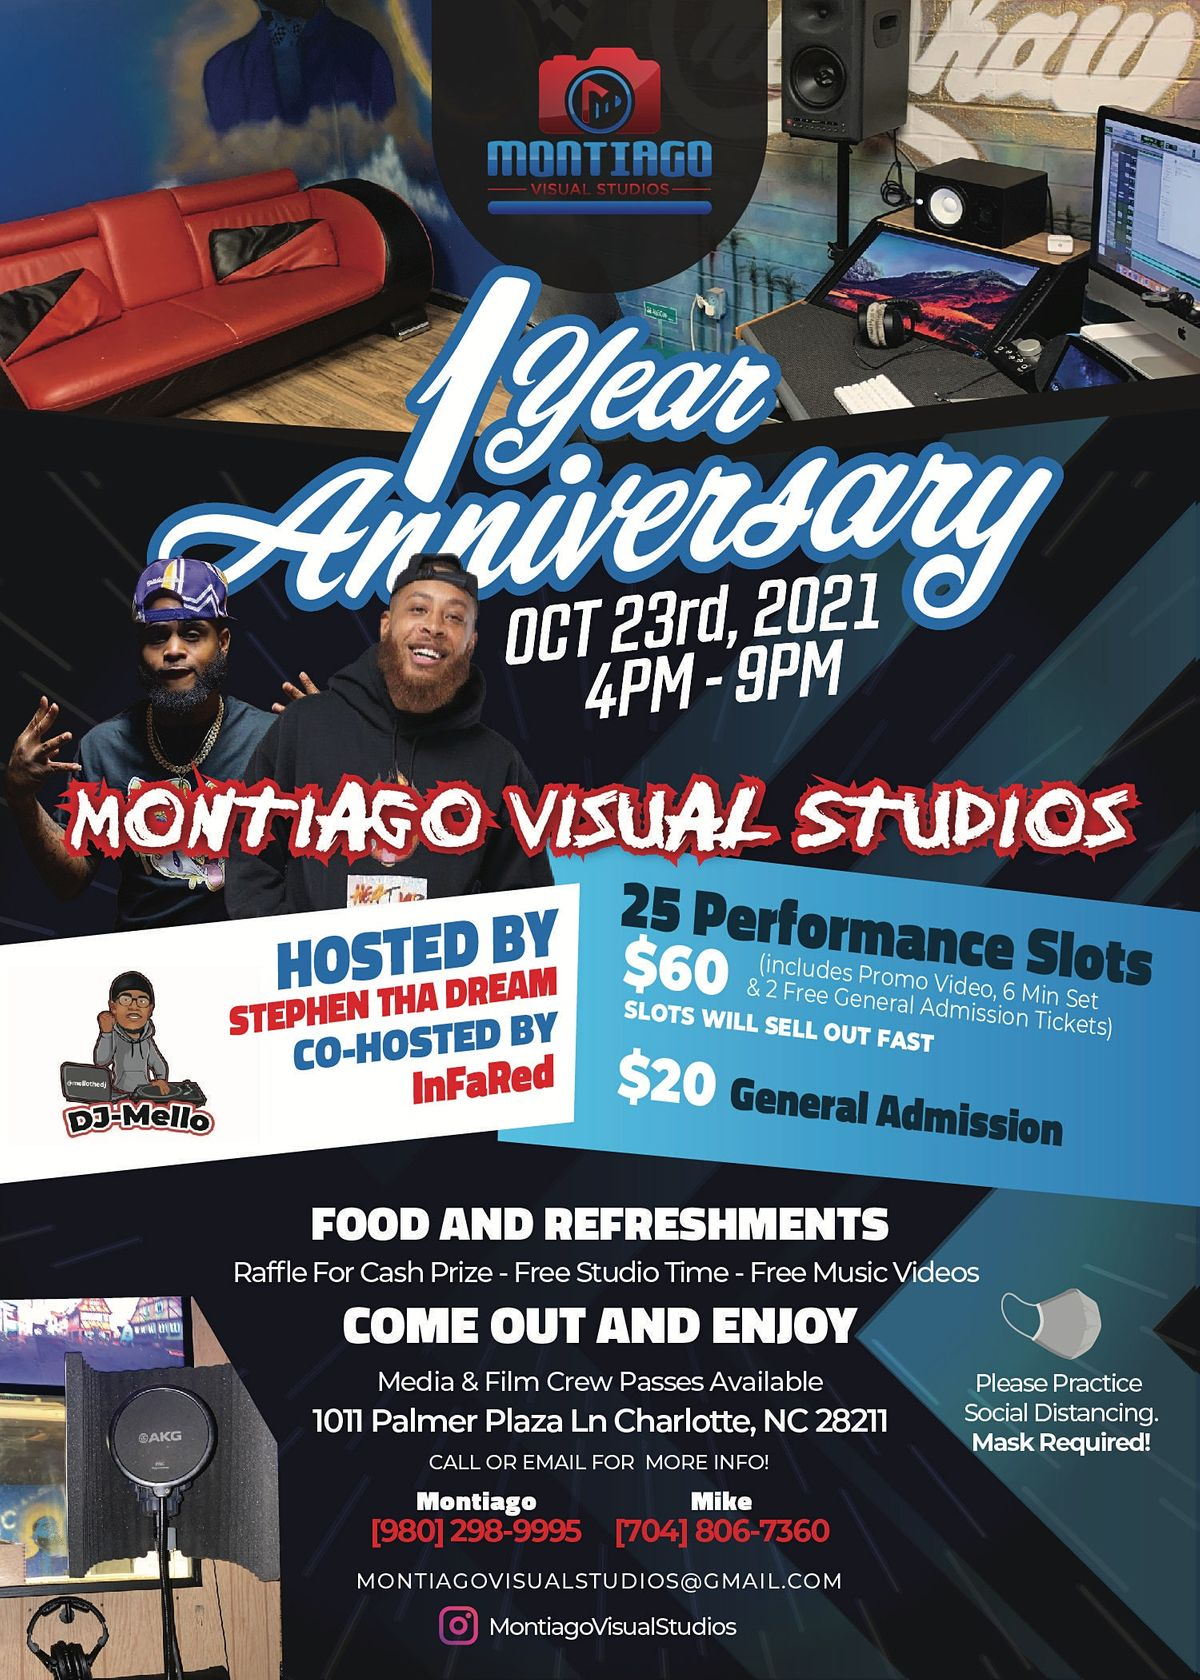 Montiago Visual Studios 1 Year Anniversary